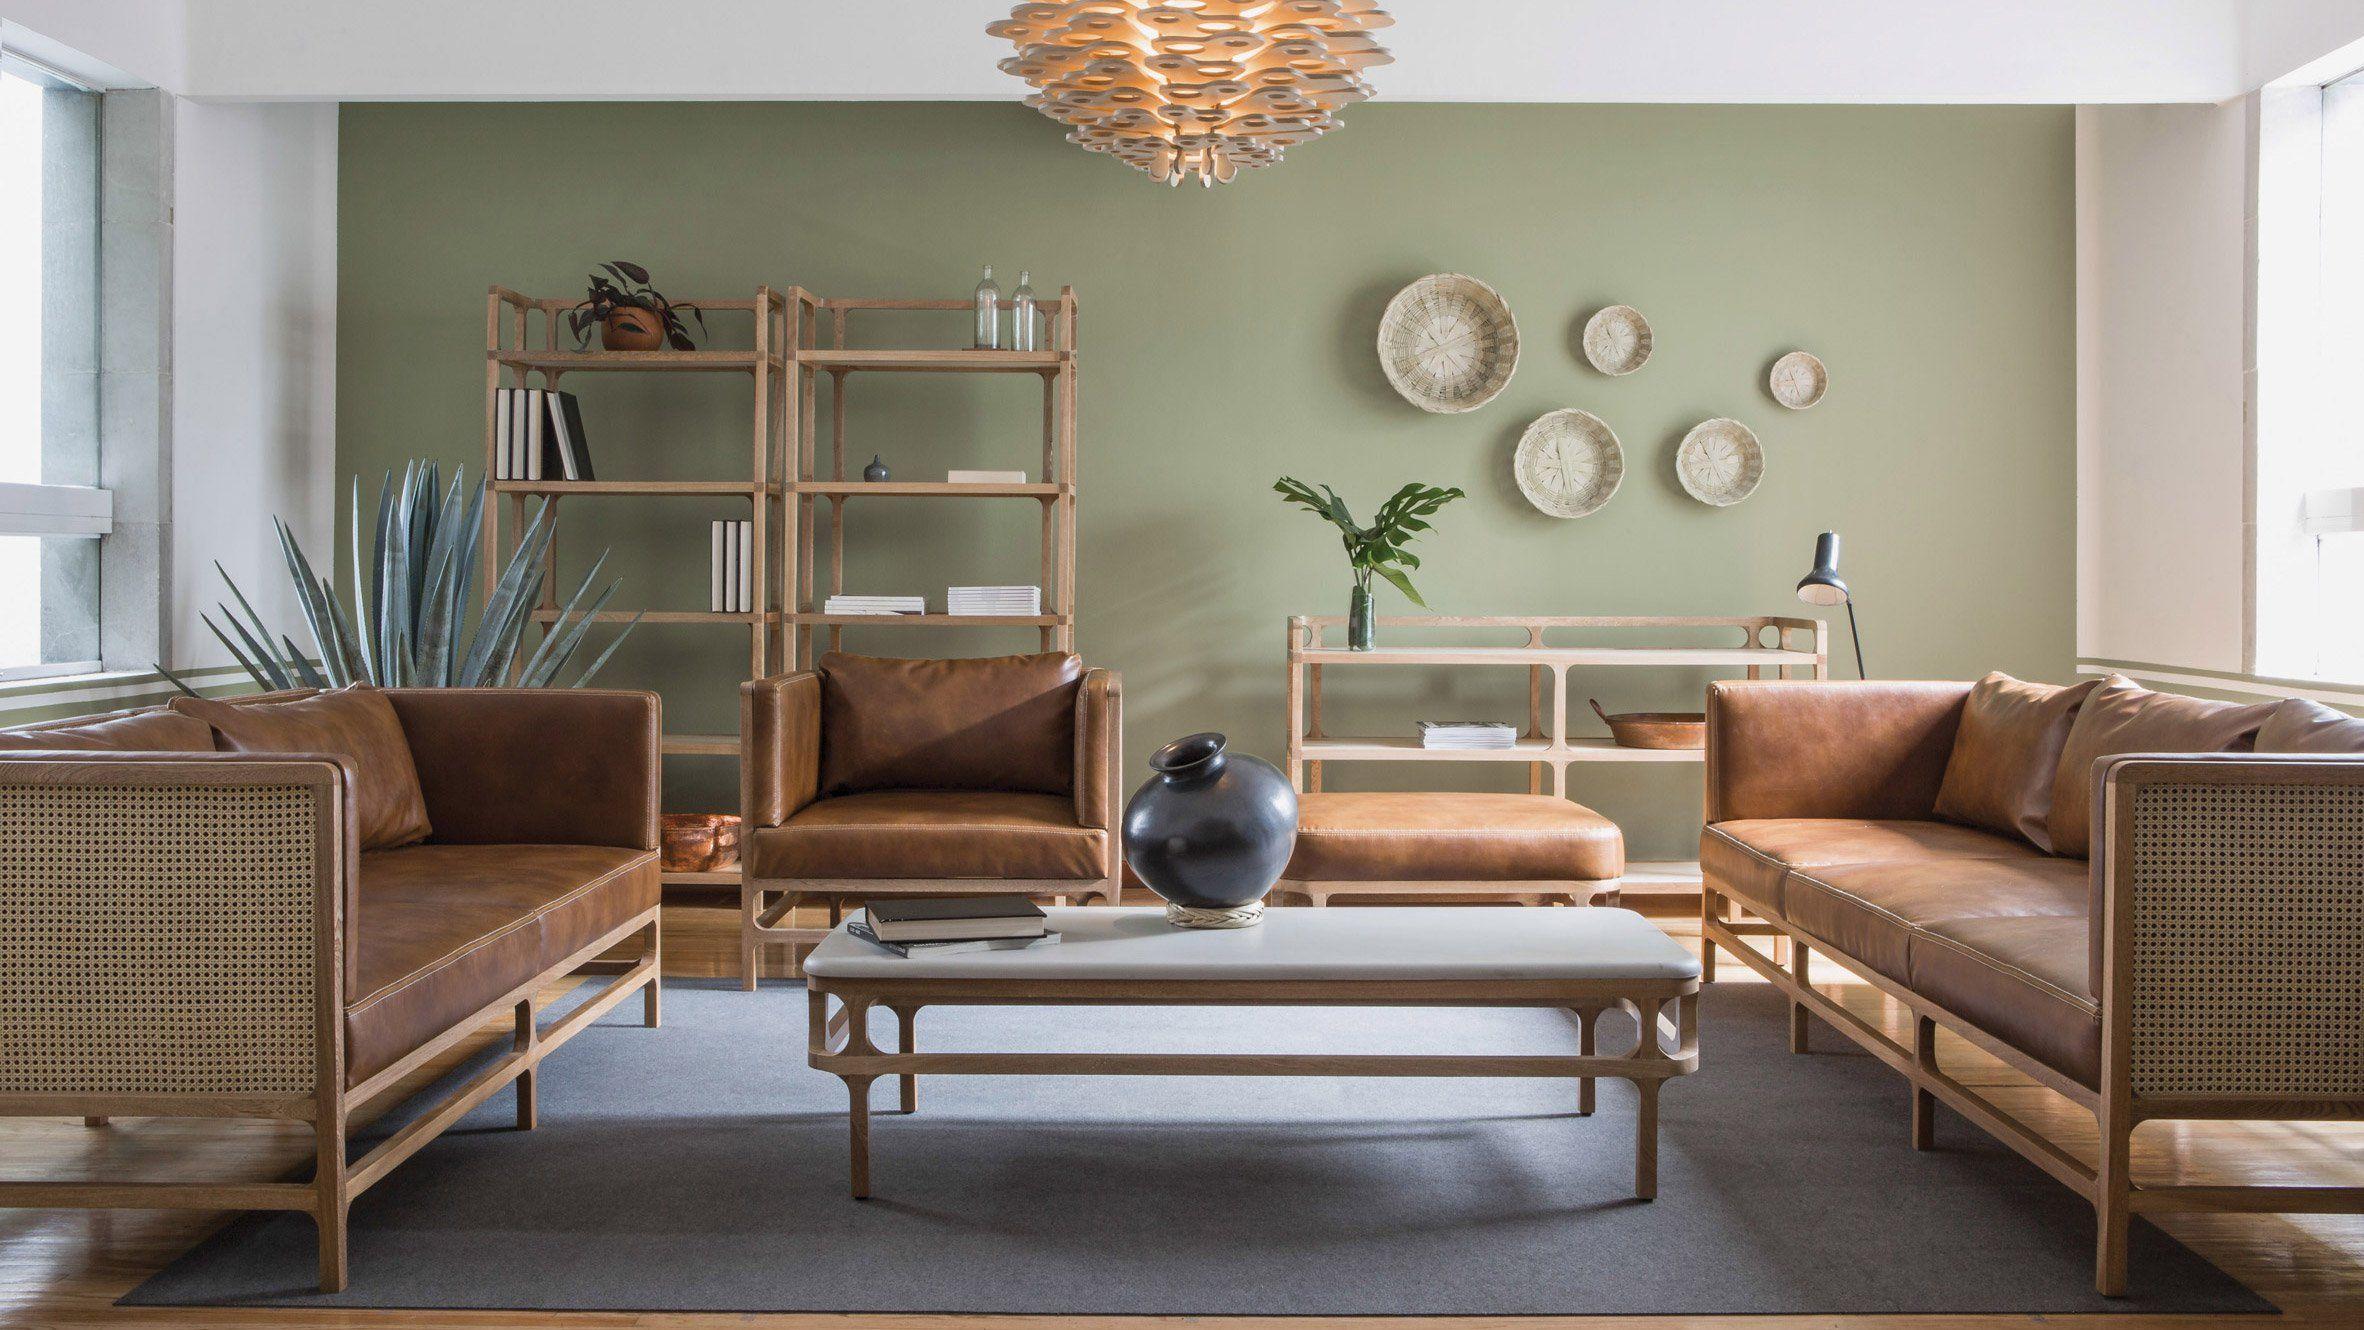 prima by pirwi interior design pinterest mexican crafts rh pinterest com